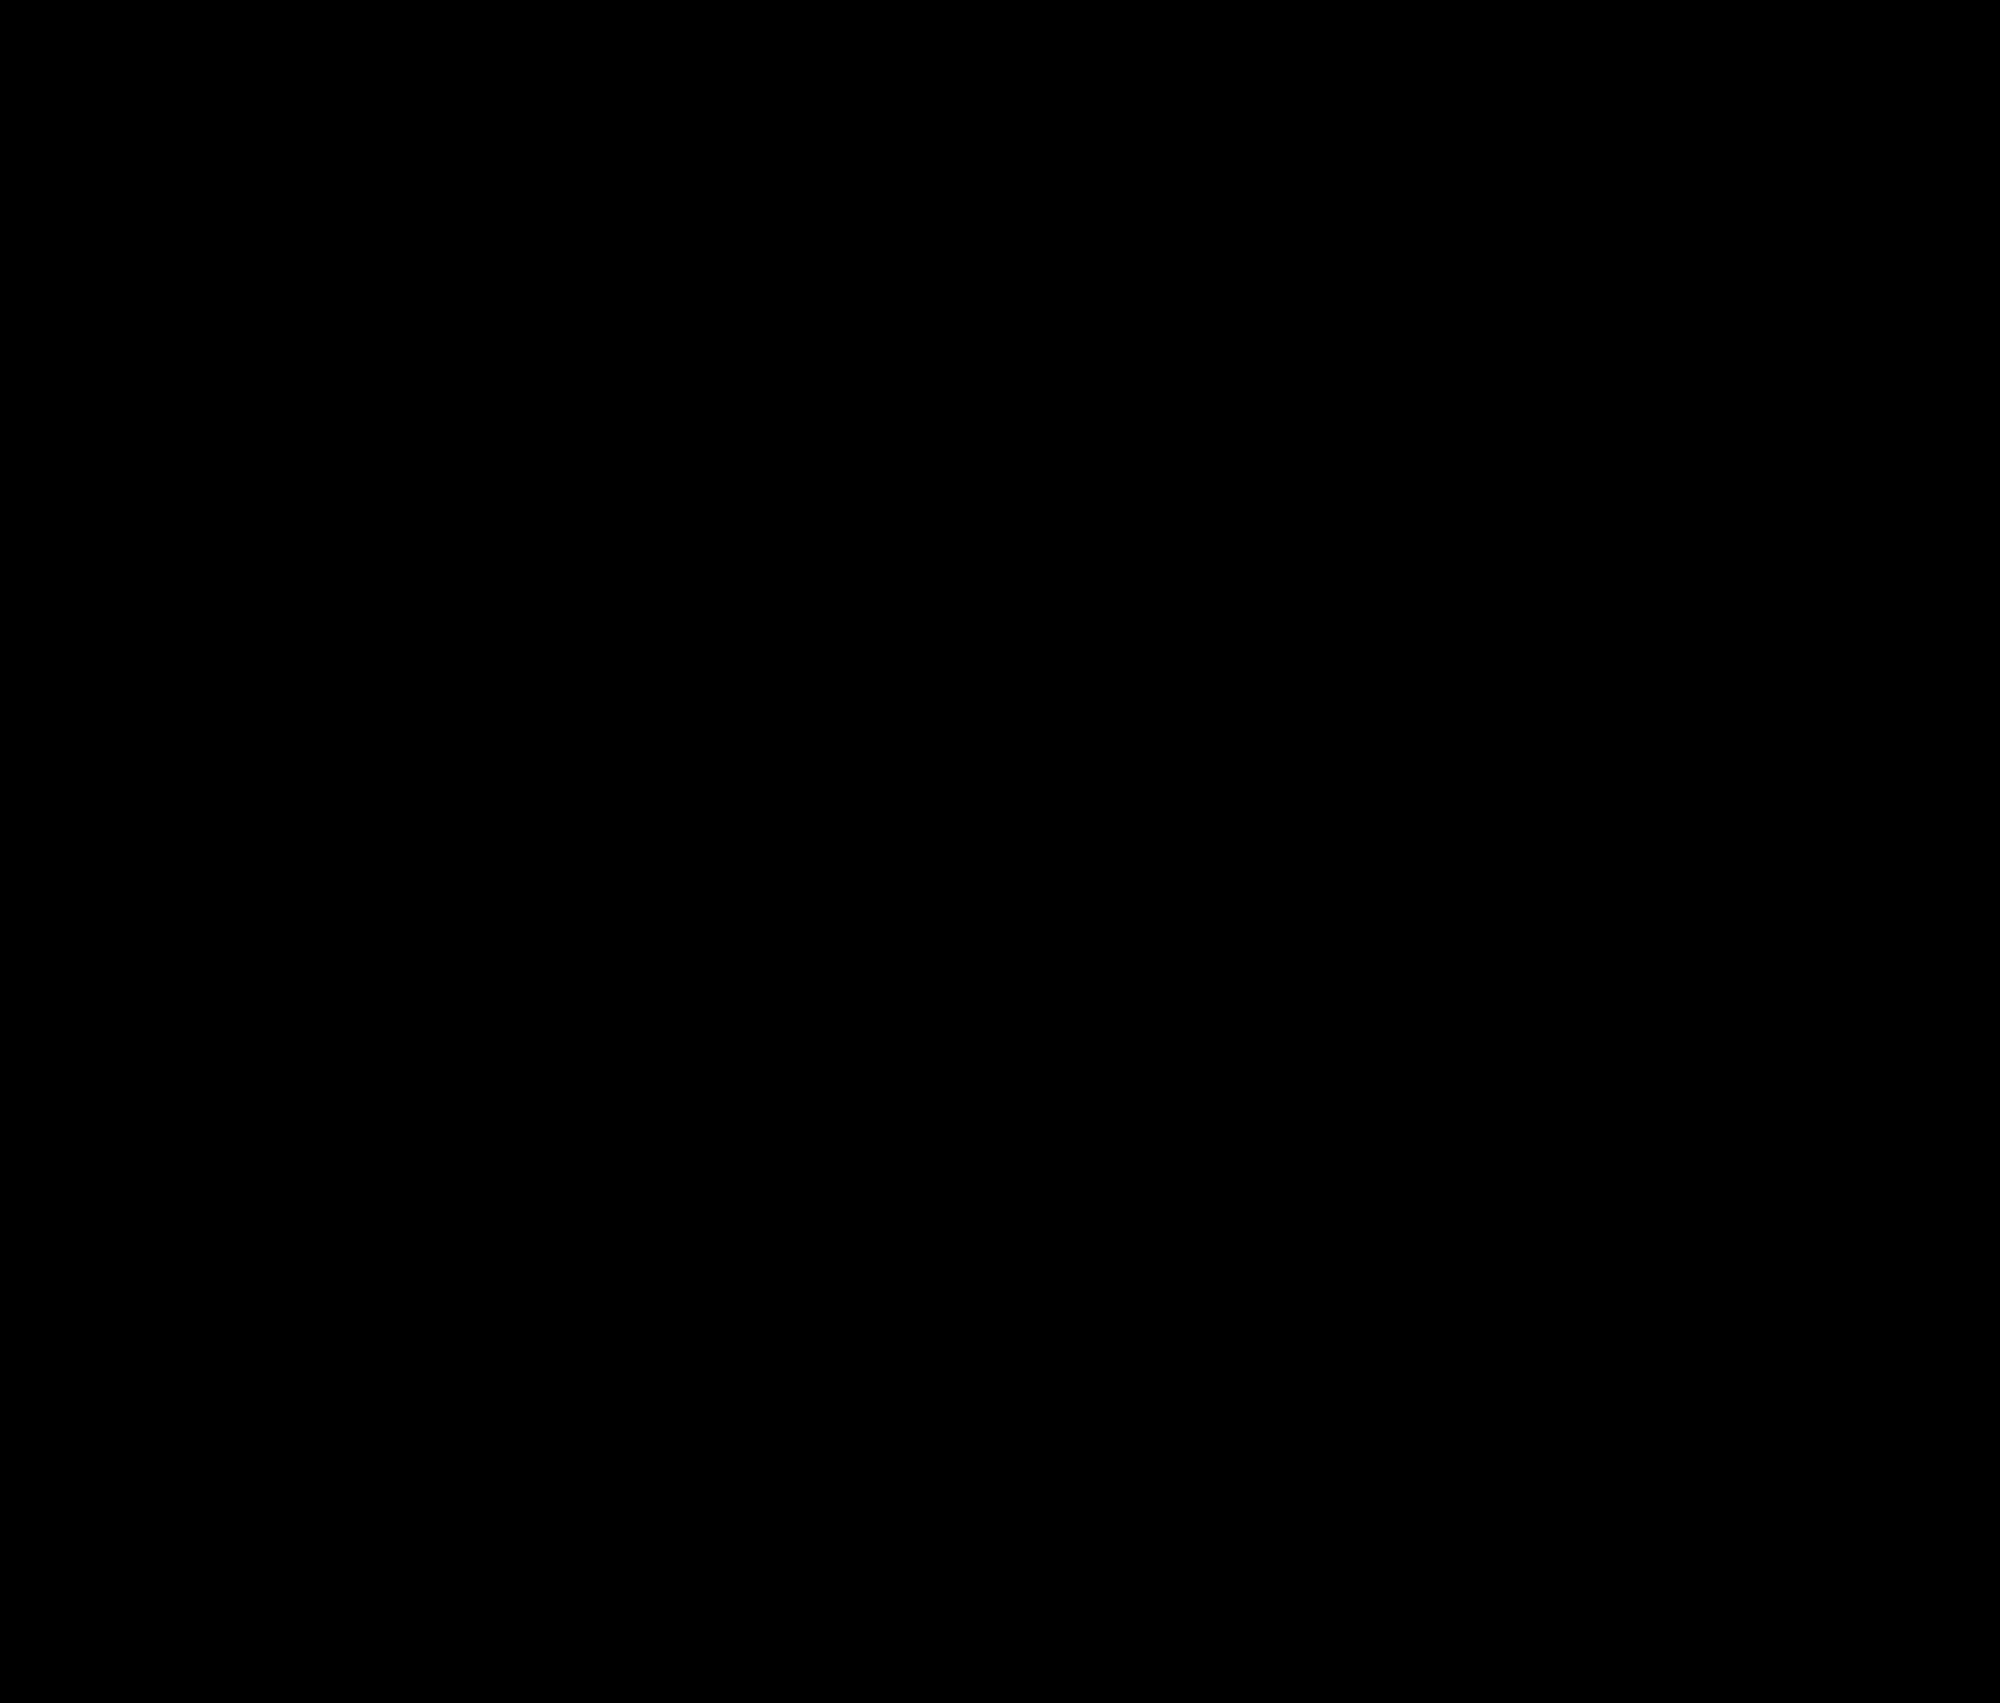 EMBLEM LOGO / FAVICON